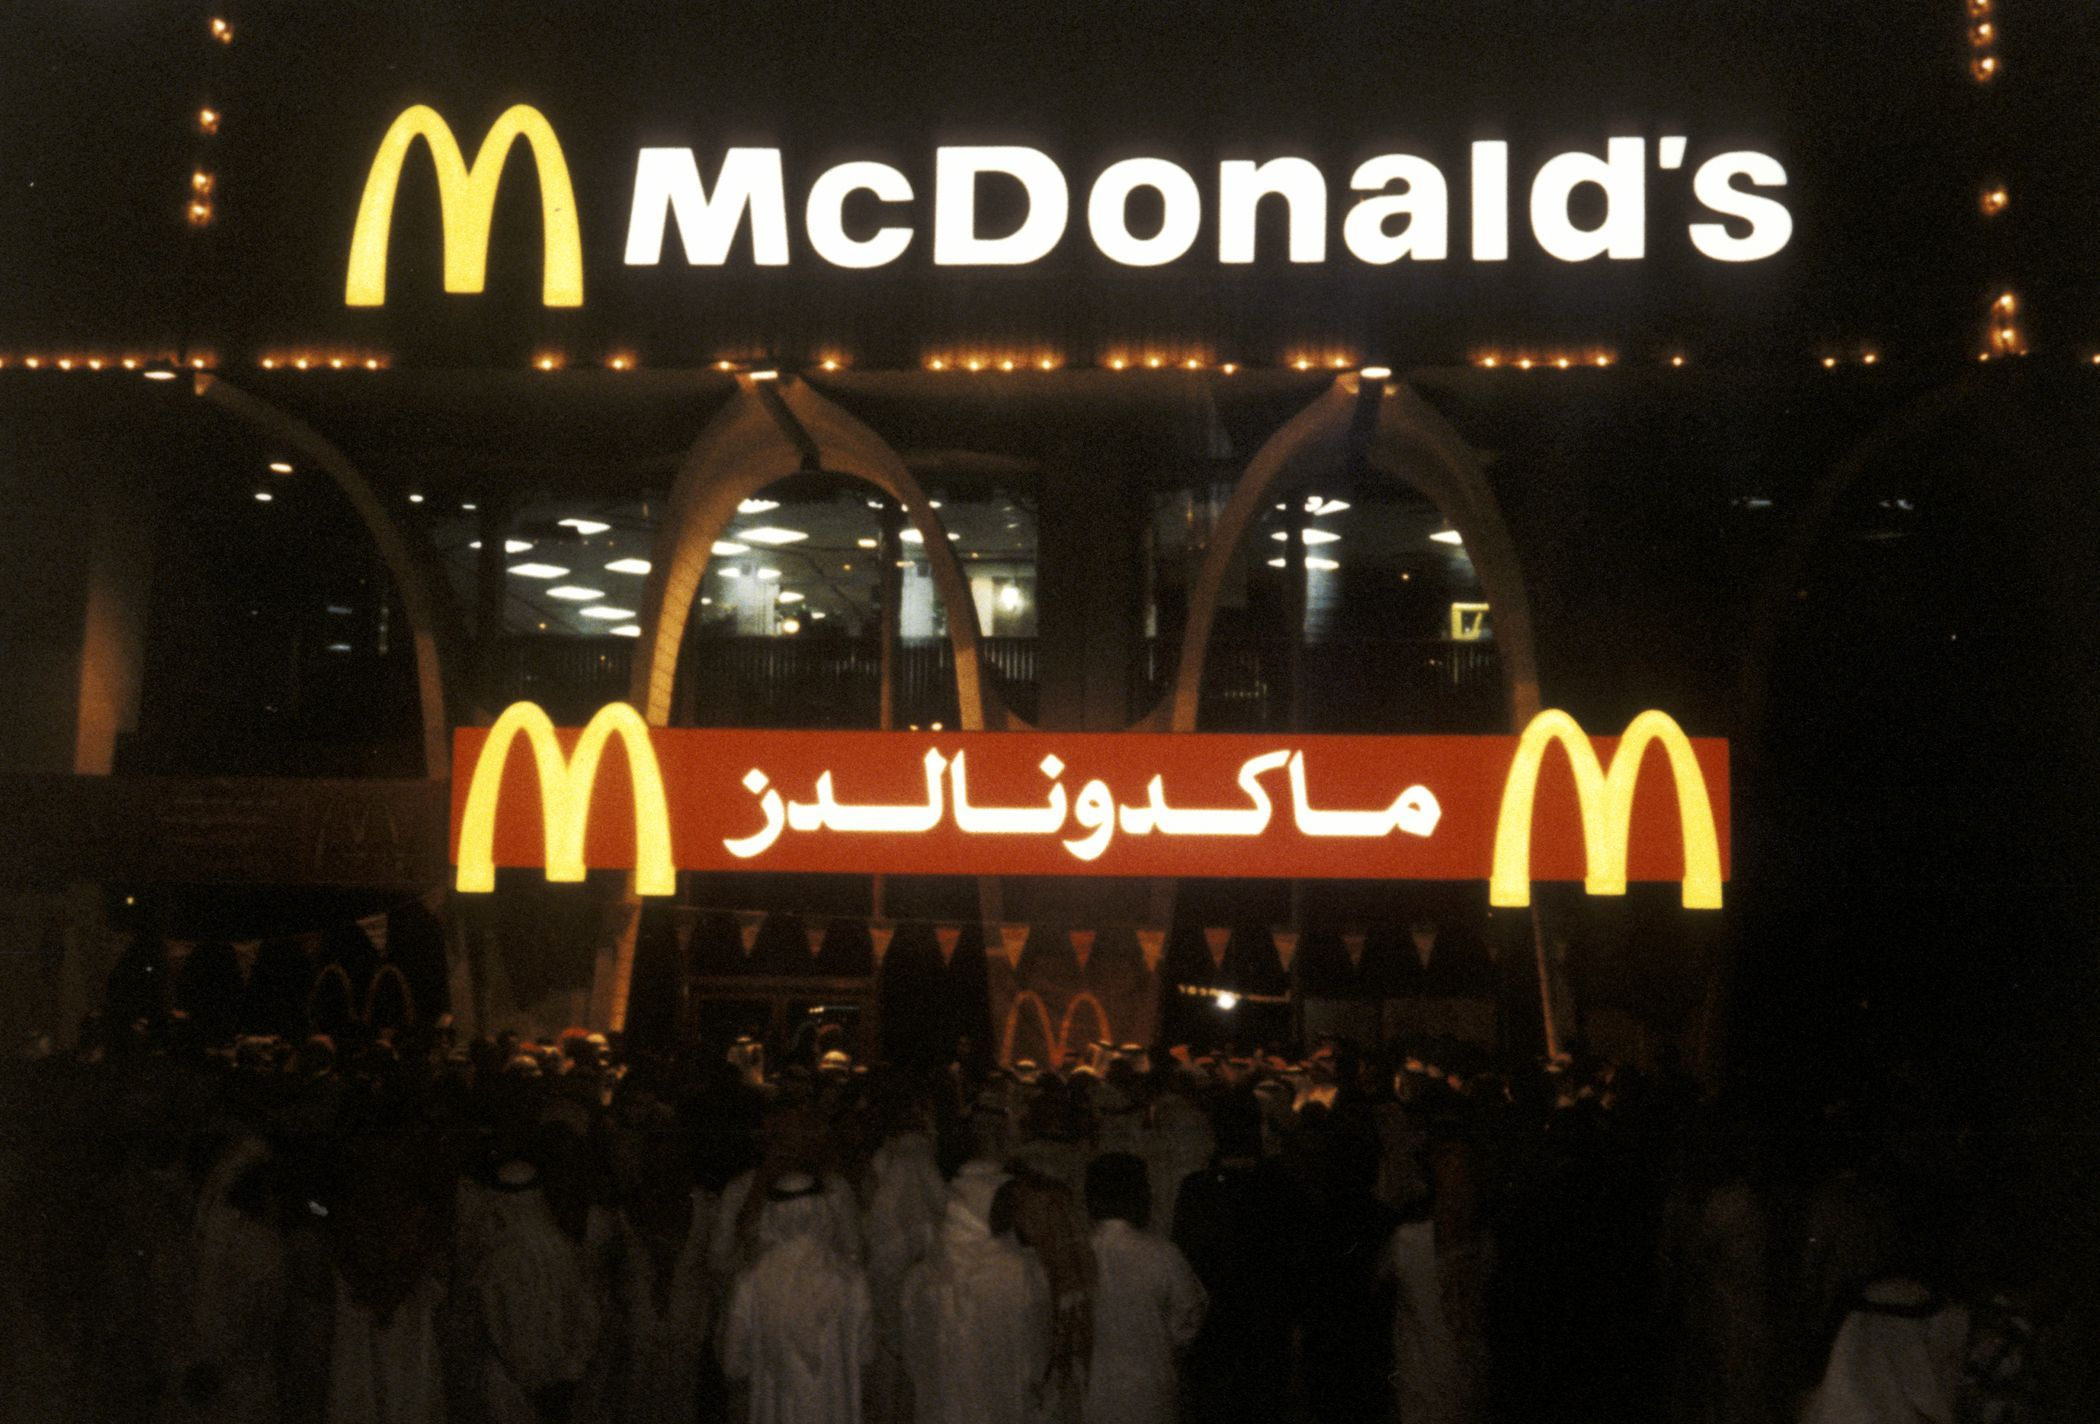 International Signage From Jeddah Saudi Arabia Jeddah Beautiful Places To Travel Saudi Arabia